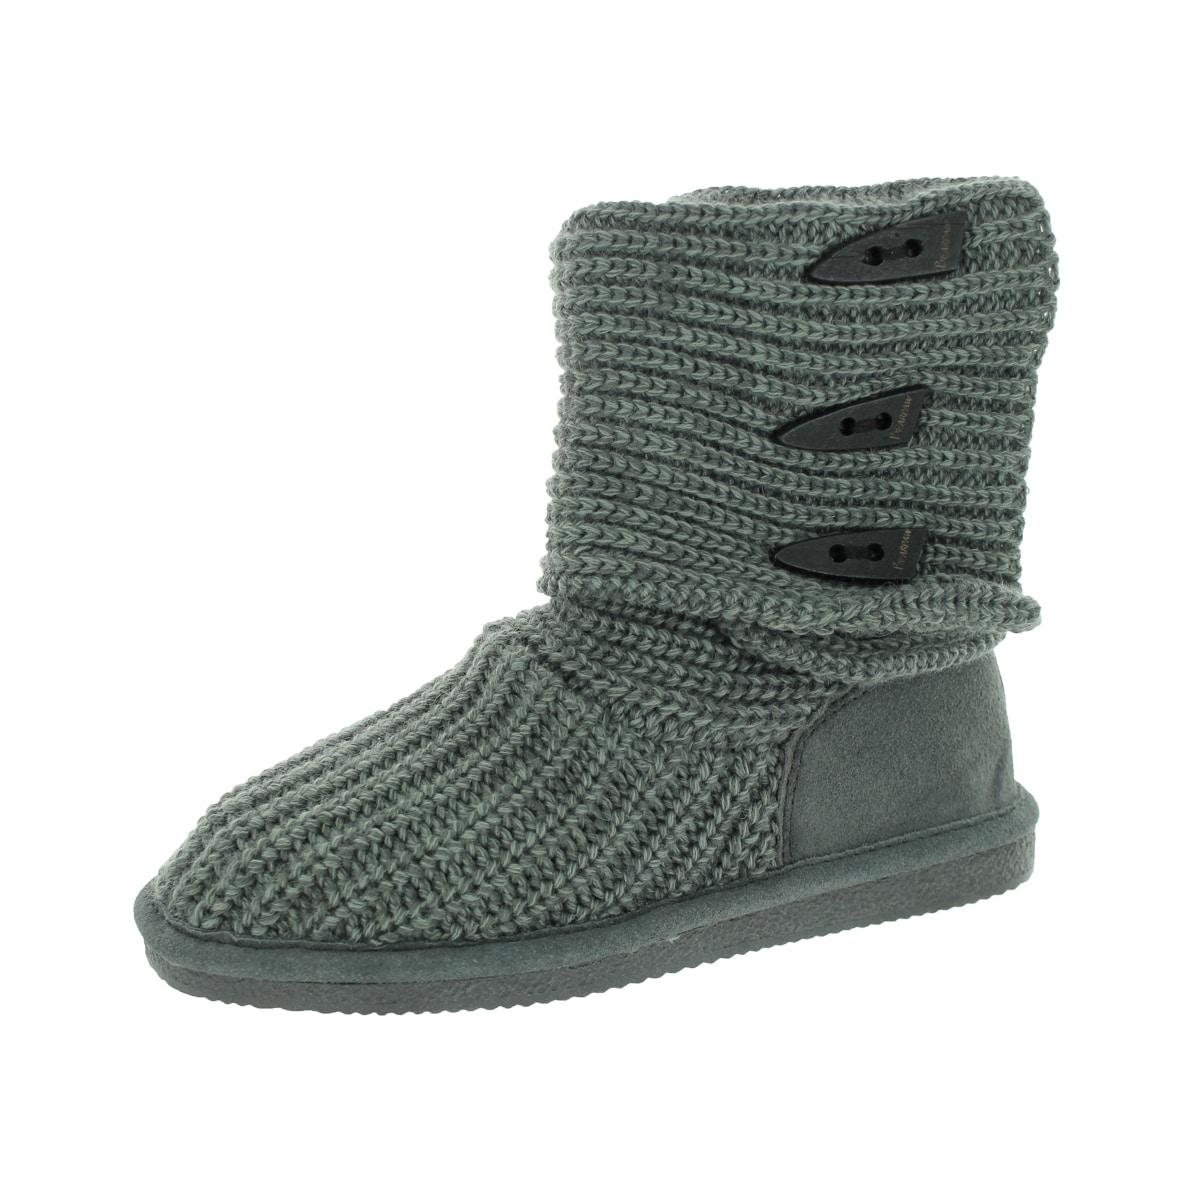 Bearpaw Women's Knit Tall Grey Boot (7)